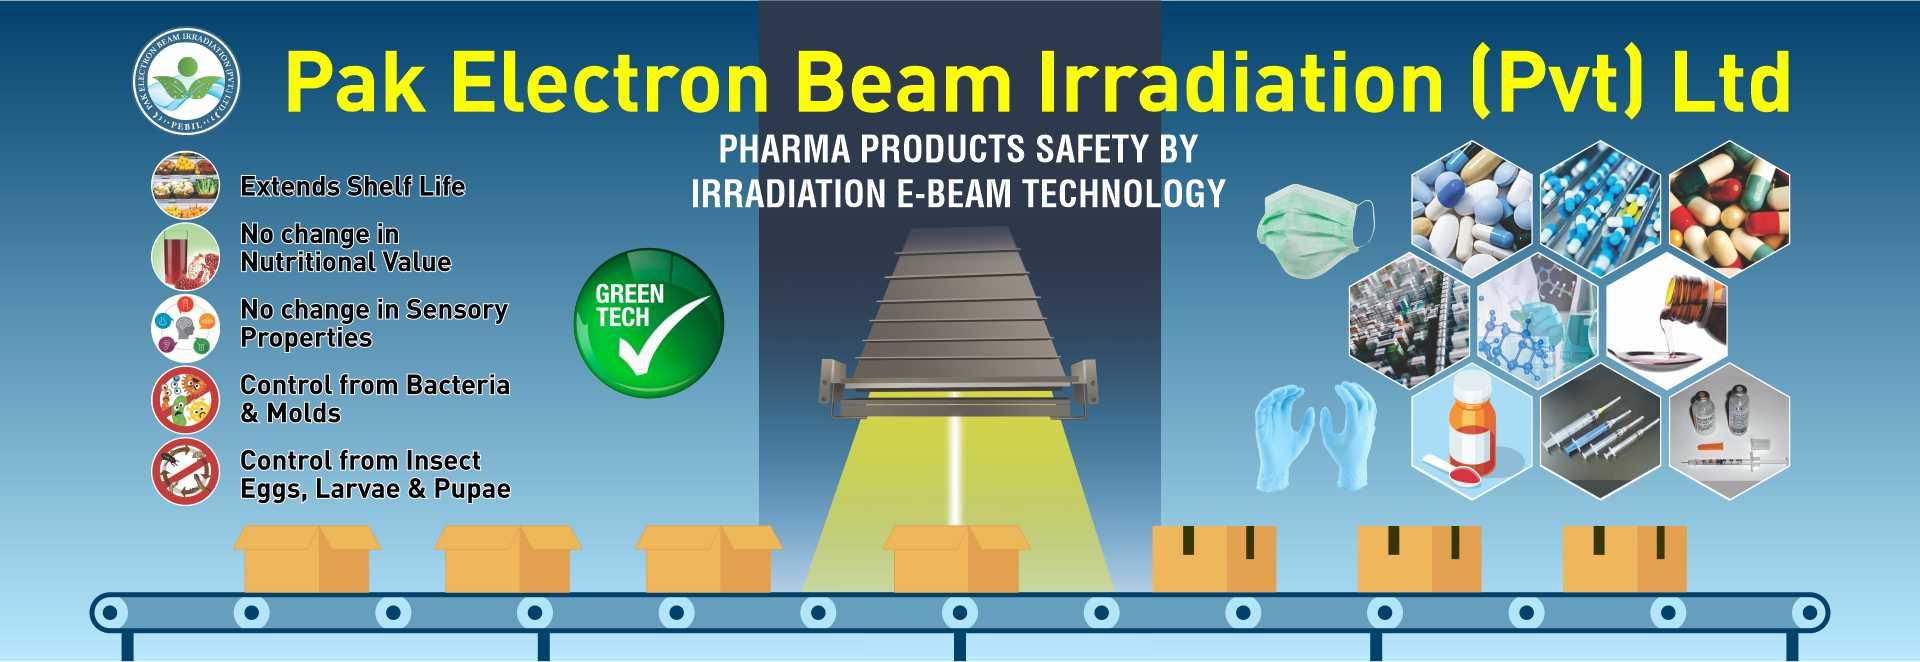 Pak Electron Beam Irradiation (Pvt) Ltd